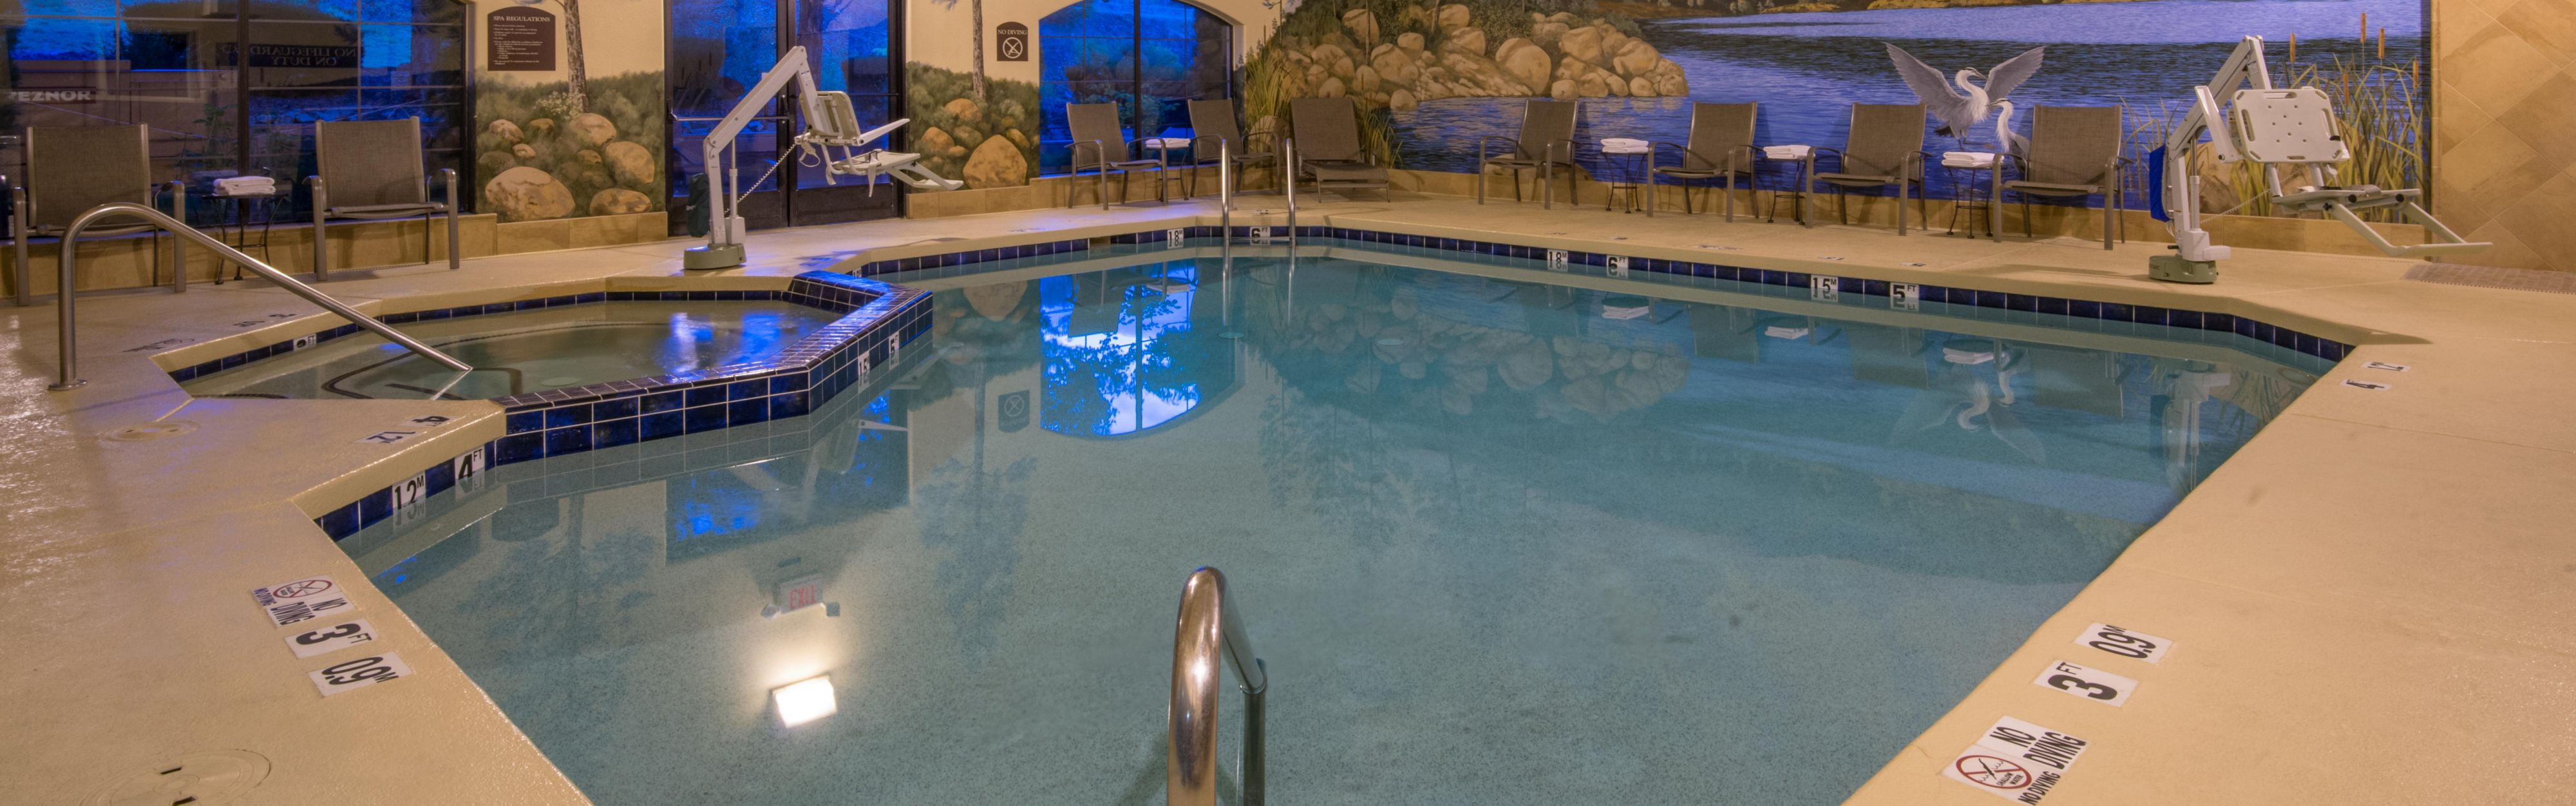 Holiday Inn Express Prescott image 2